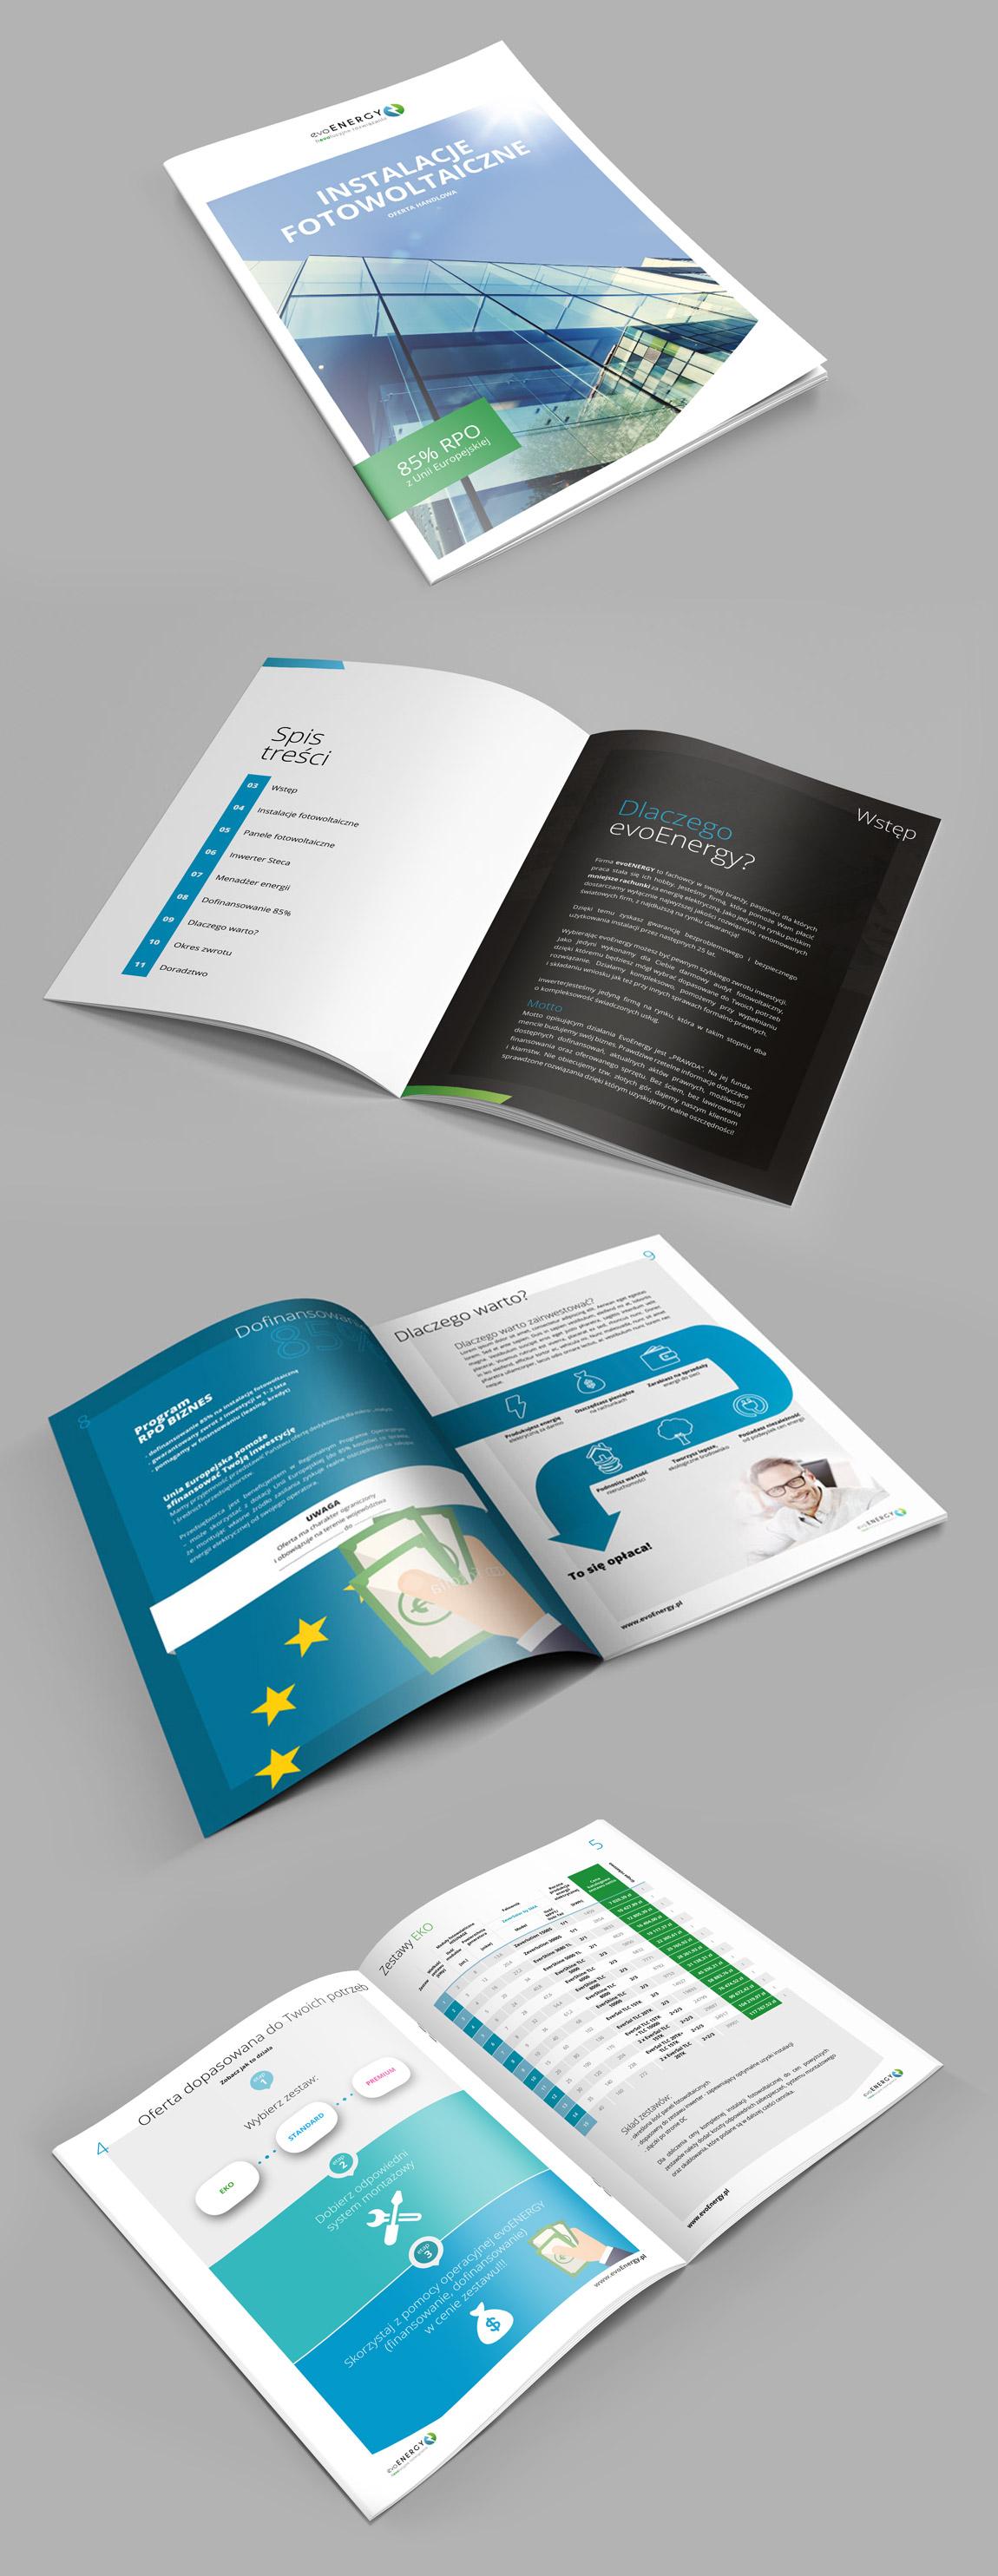 evoEnergy - broszura drukowana, poligrafia